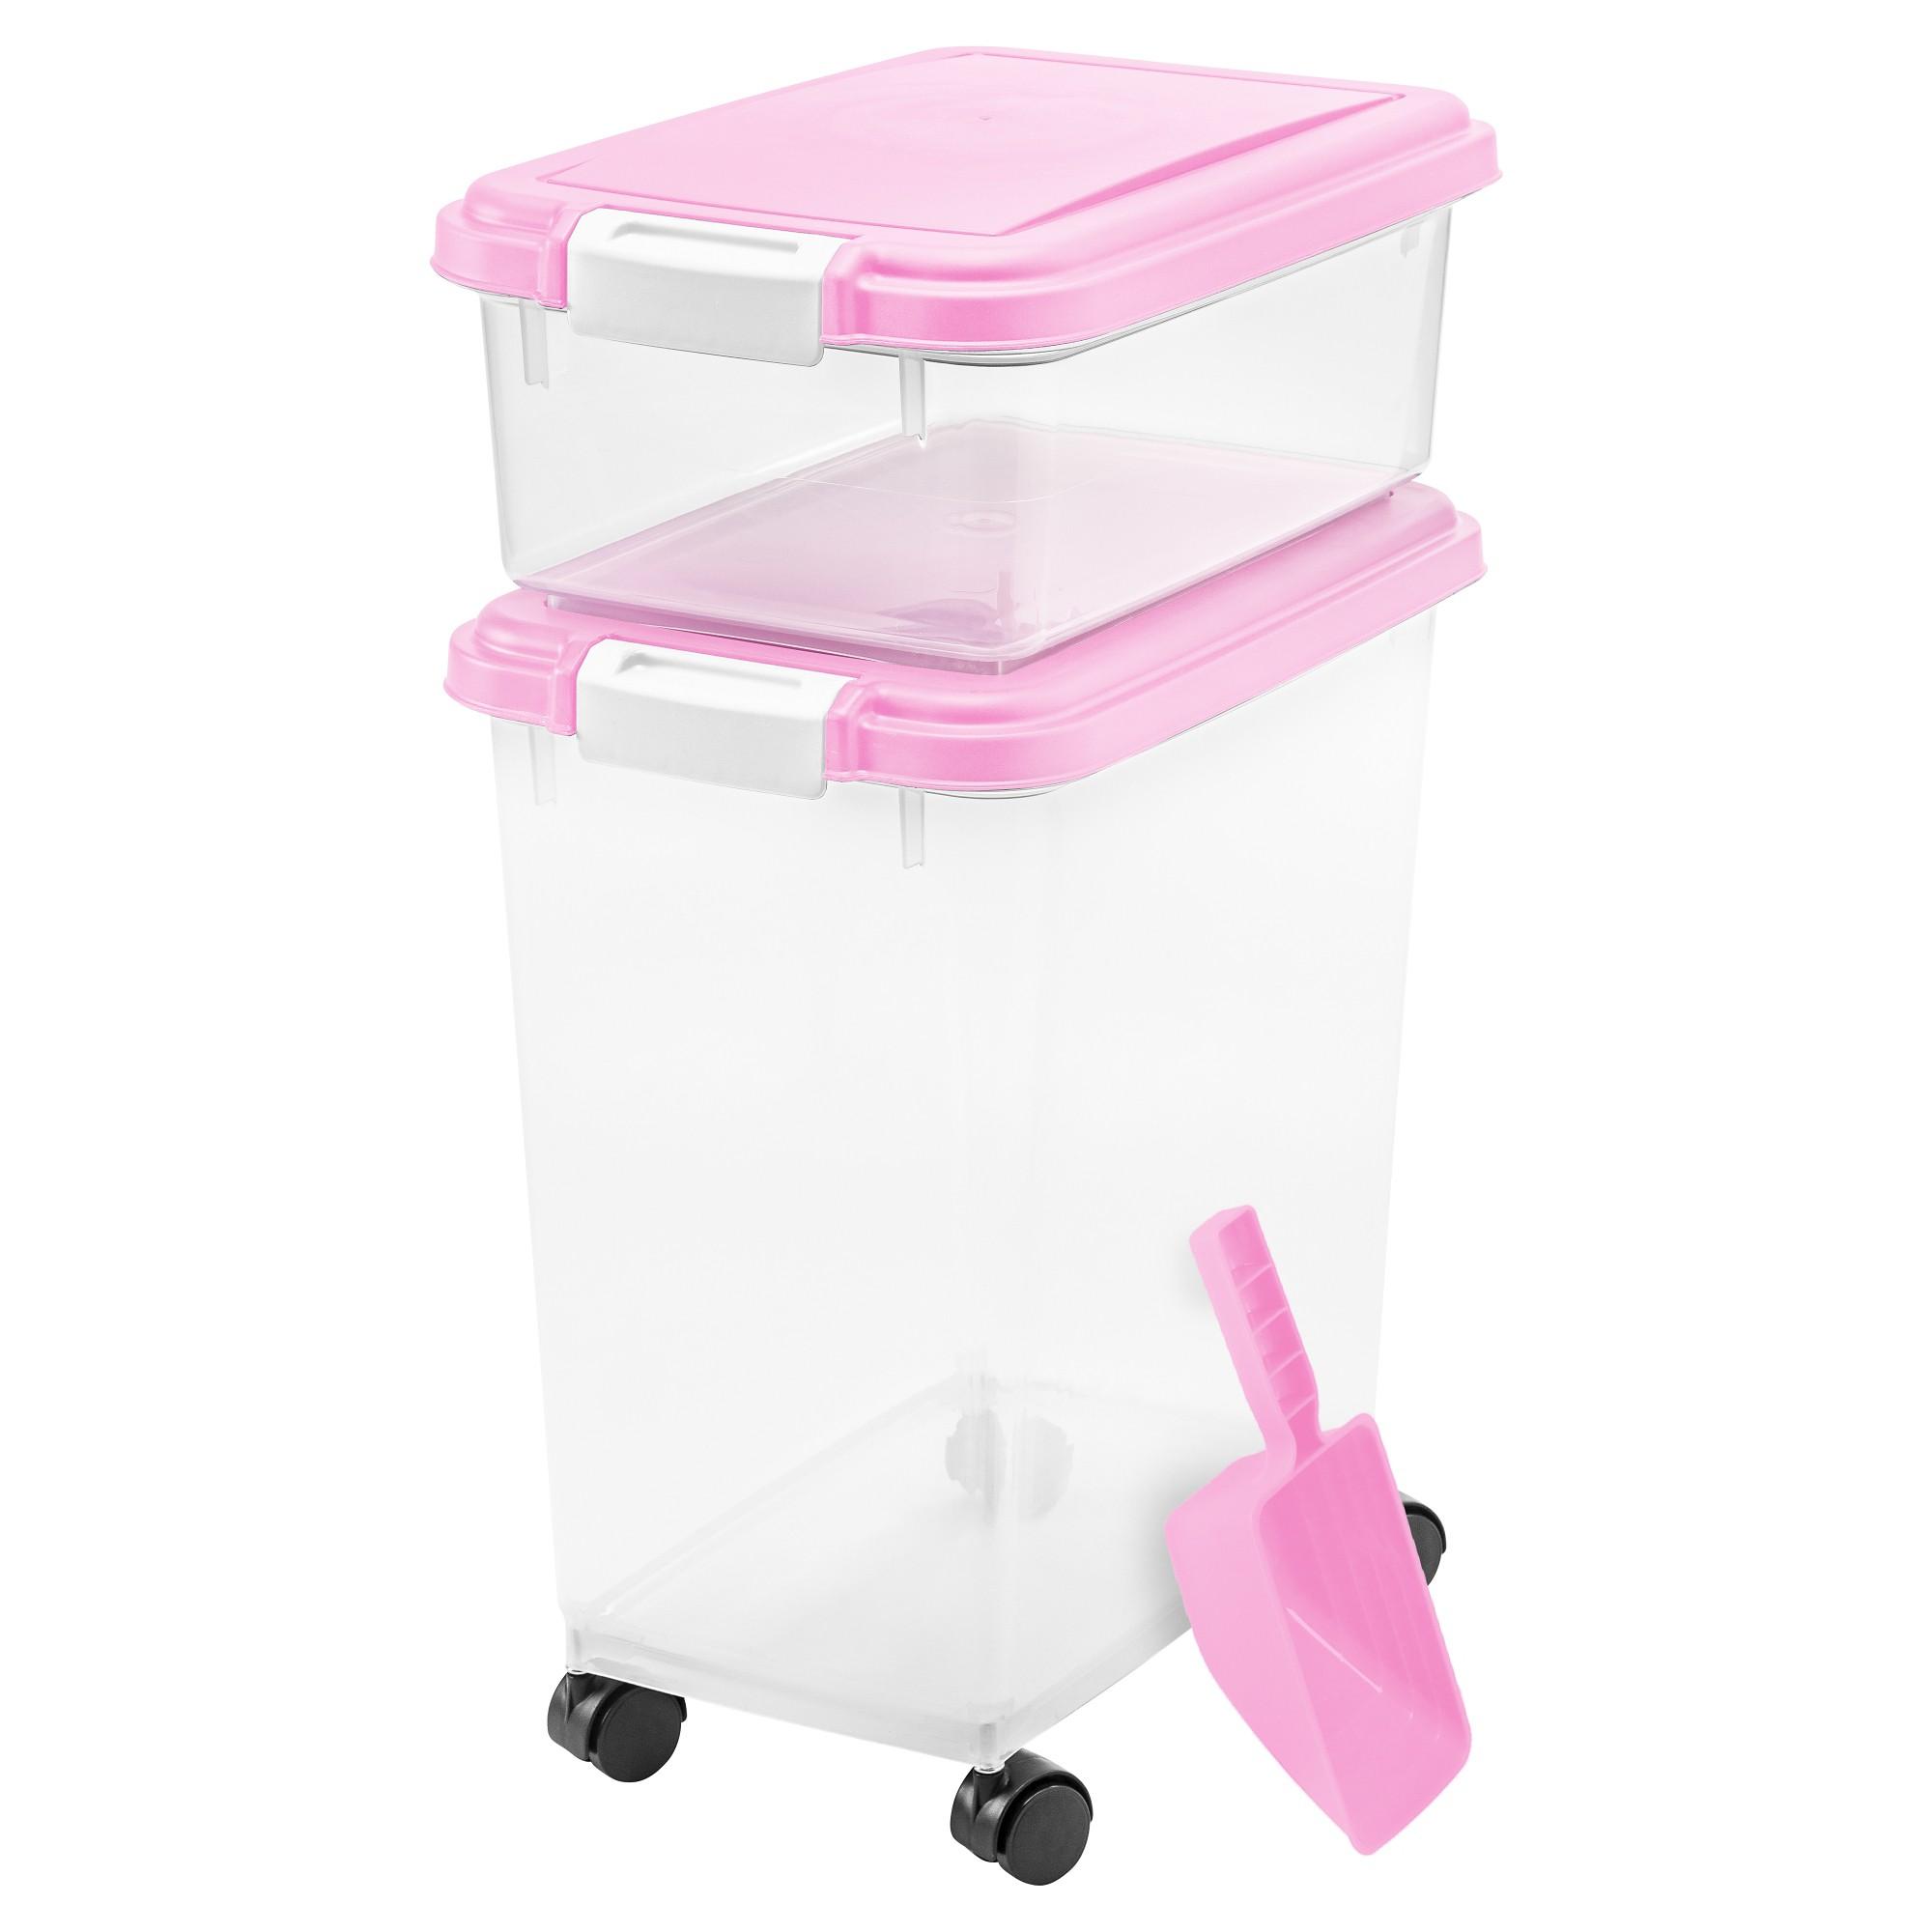 Iris 3pc Airtight Pet Food Storage Set Pink Pet Food Container